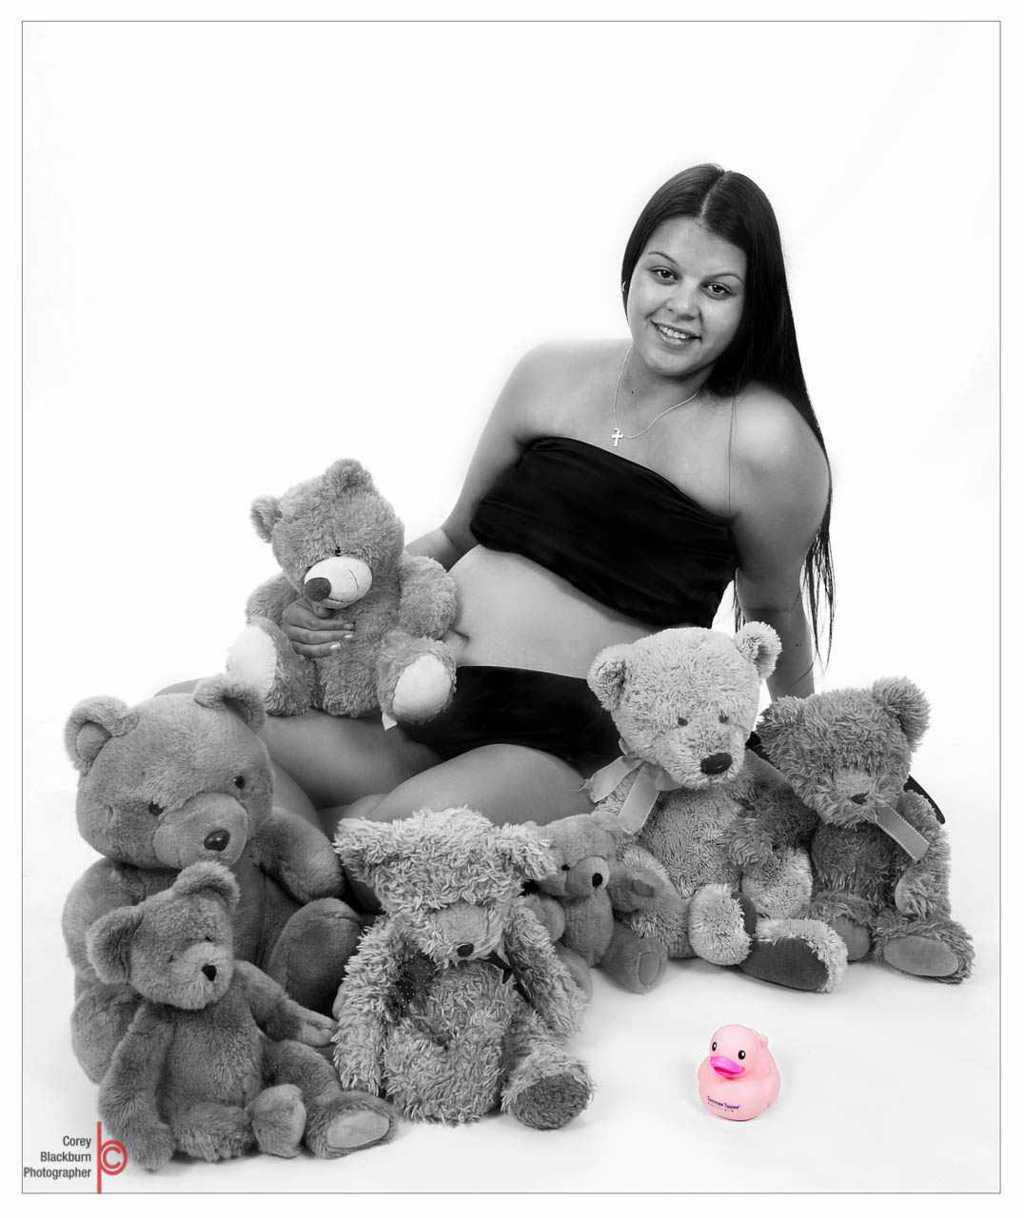 Pregnancy 21 - Corey Blackburn Photographer - Weddings   Pregnancy   Newborn   Portrait   Fine Art   Commercial   Journalism